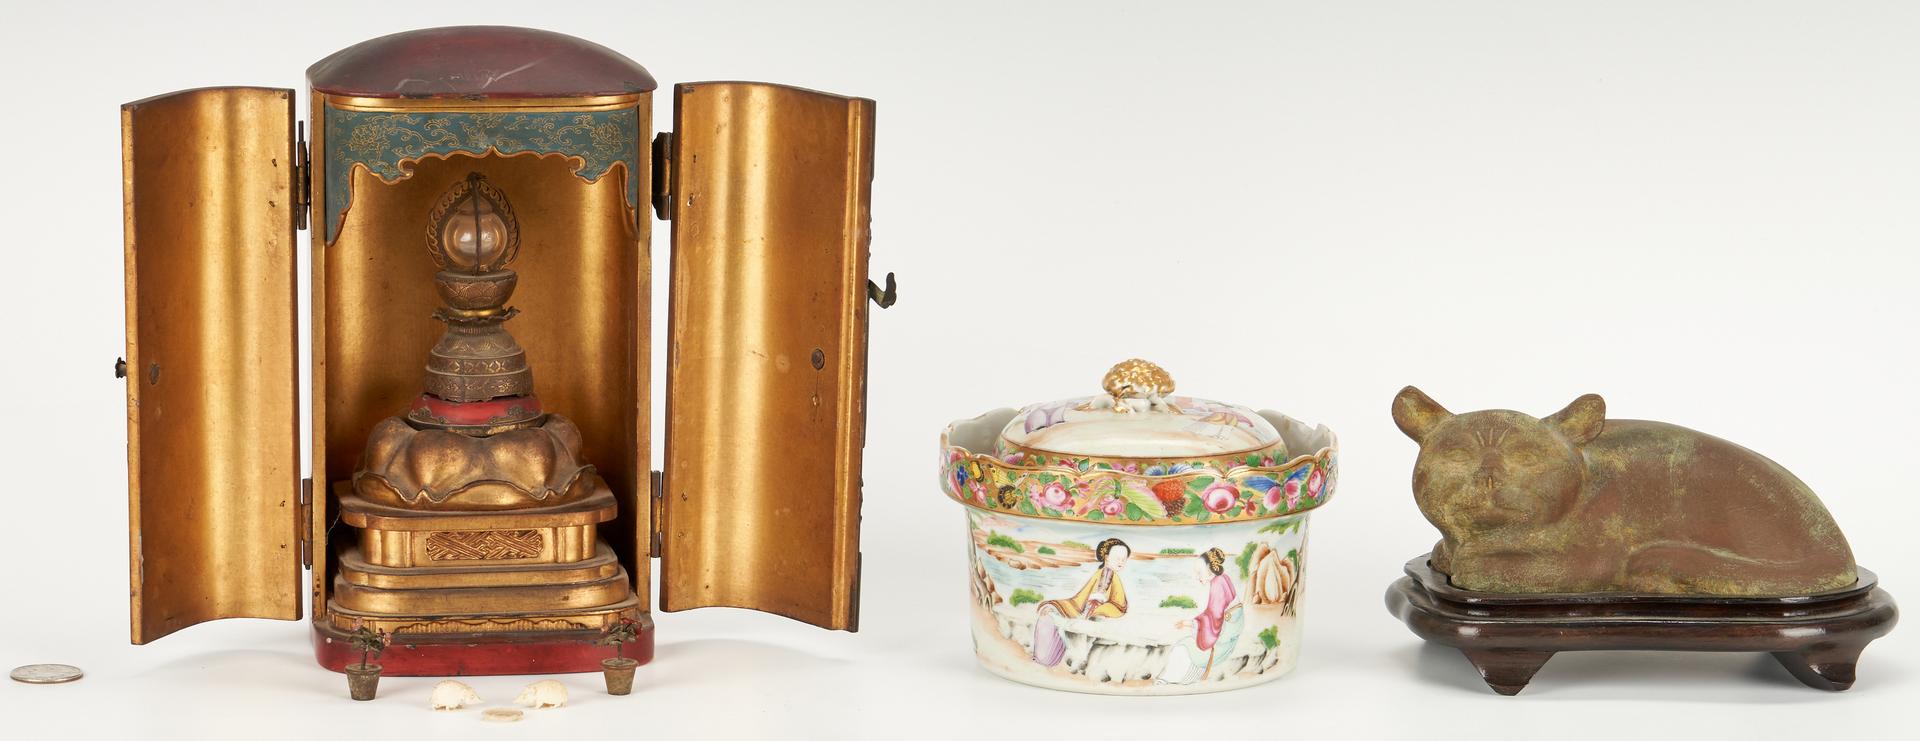 Lot 3: Asian Travel Shrine, Bronze Cat, and Famille Rose Jar